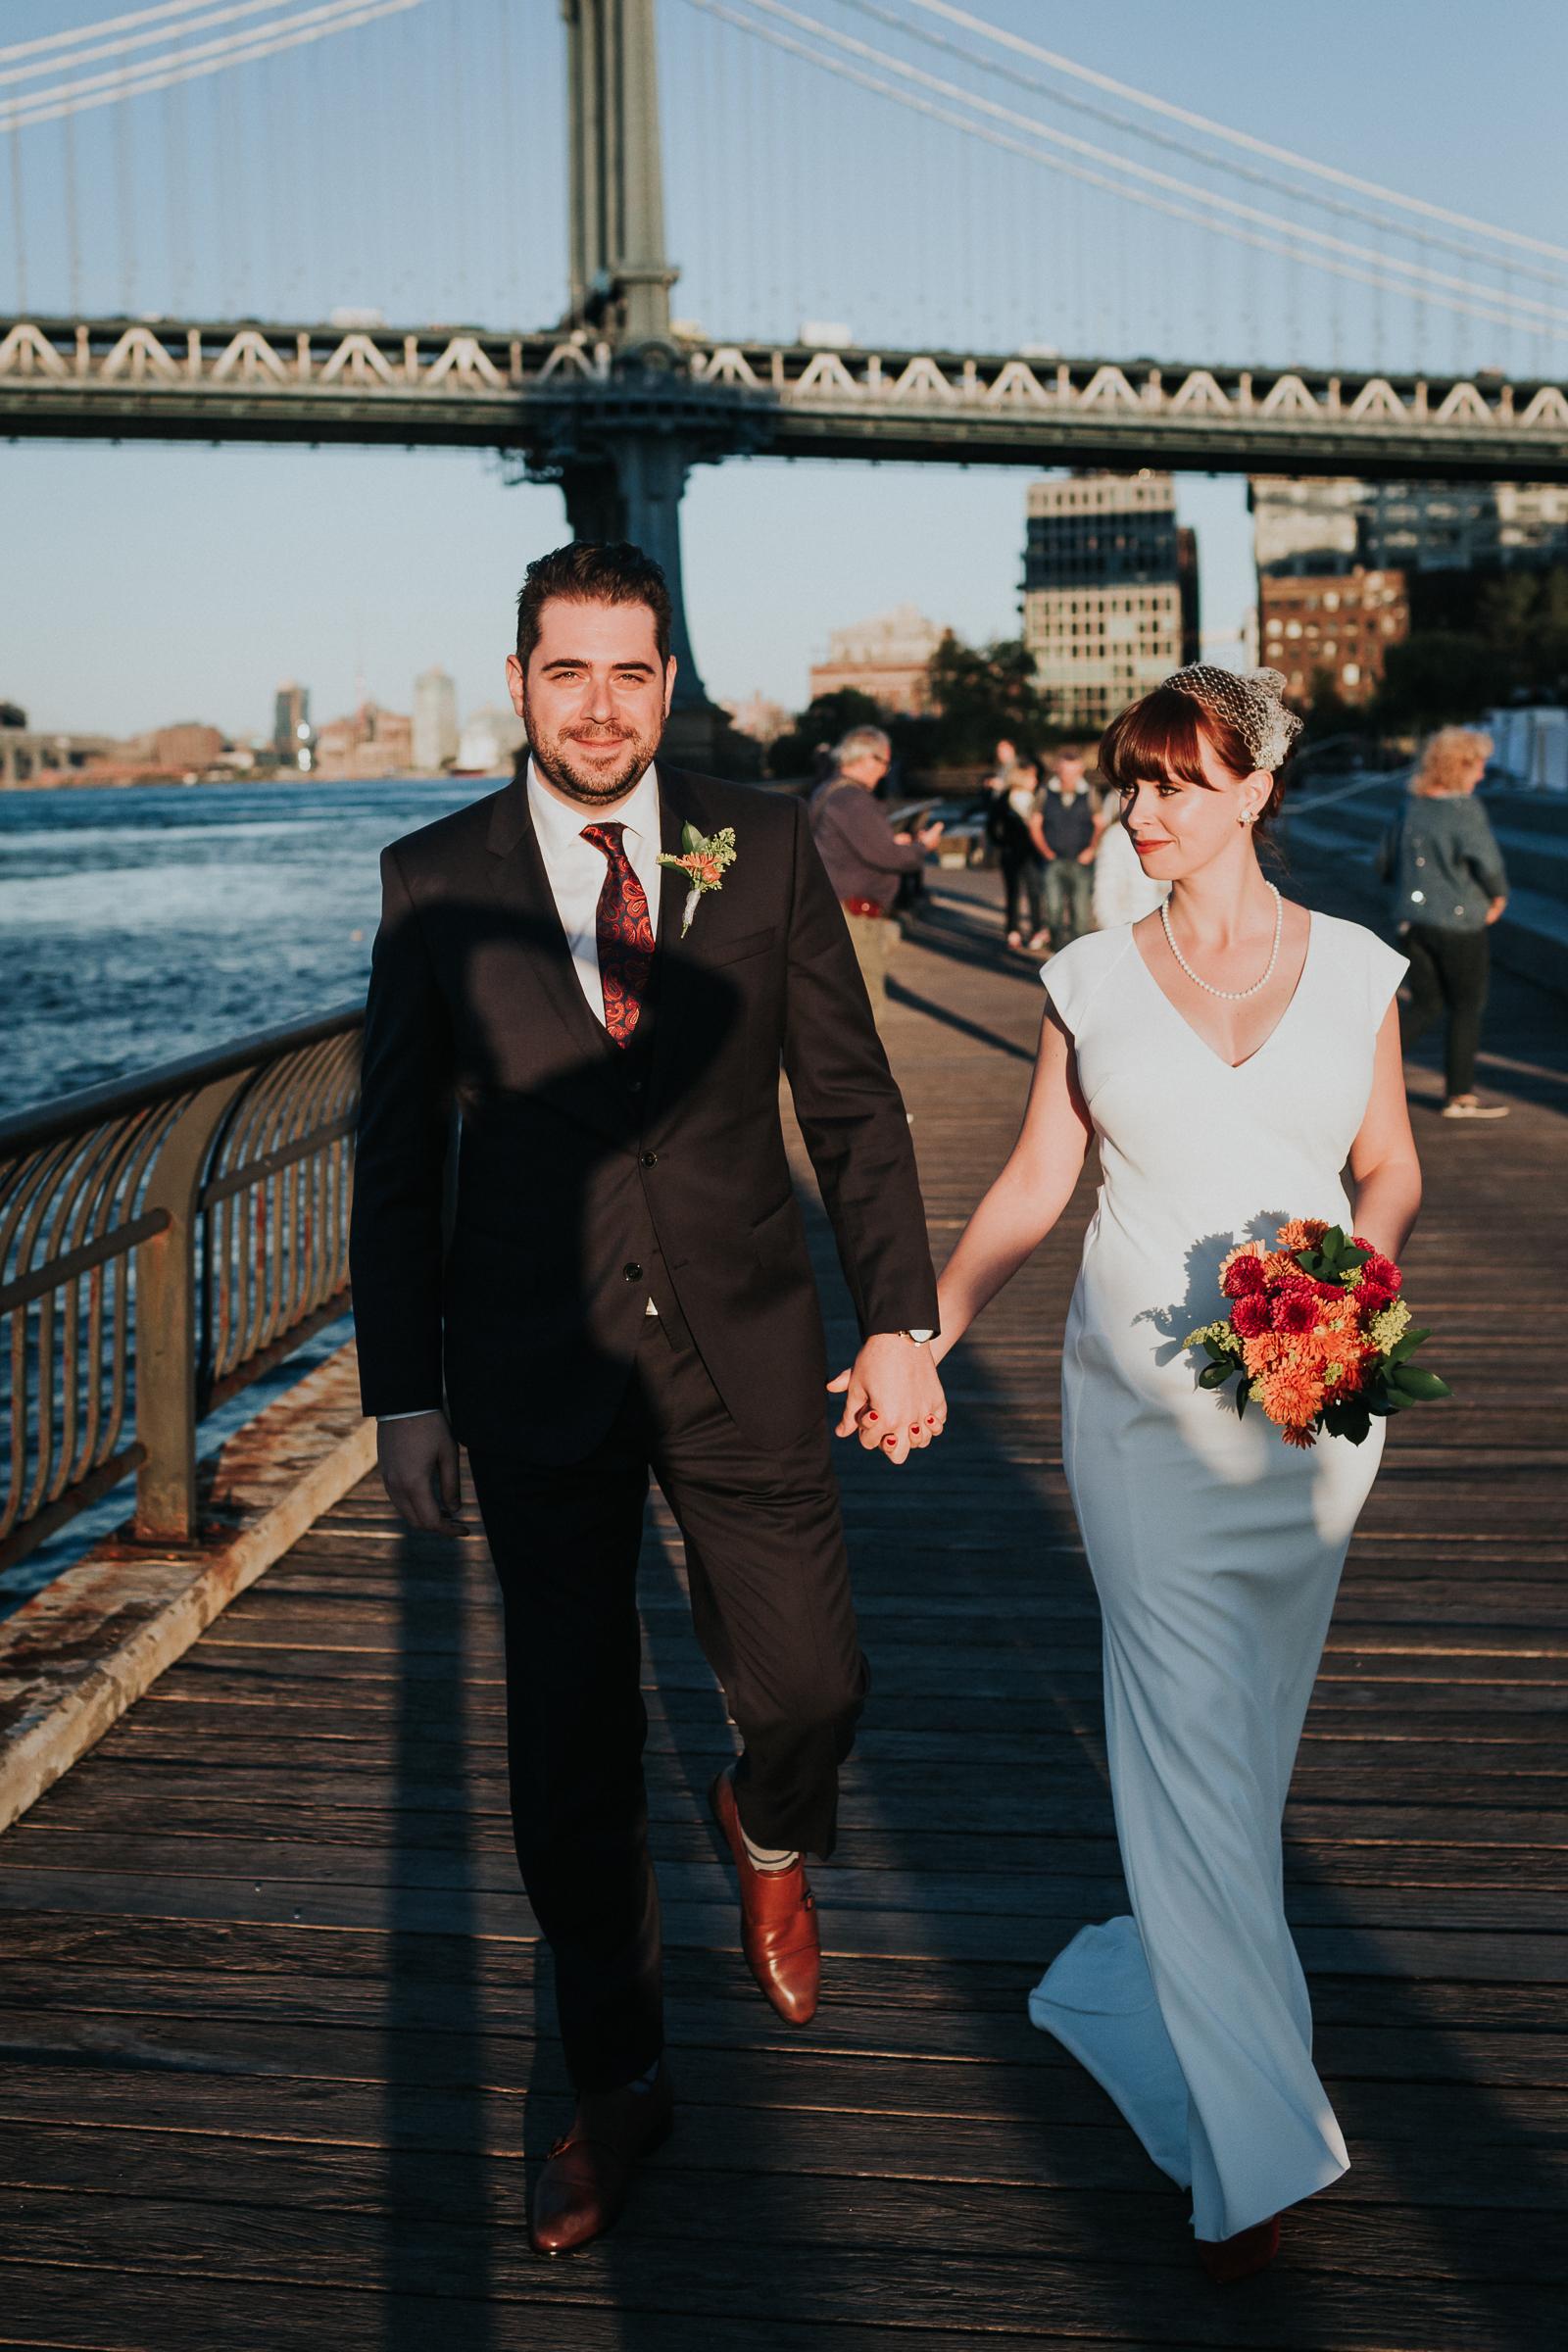 Dumbo-Brooklyn-Bridge-Park-NYC-Elopement-Documentary-Photographer-30.jpg